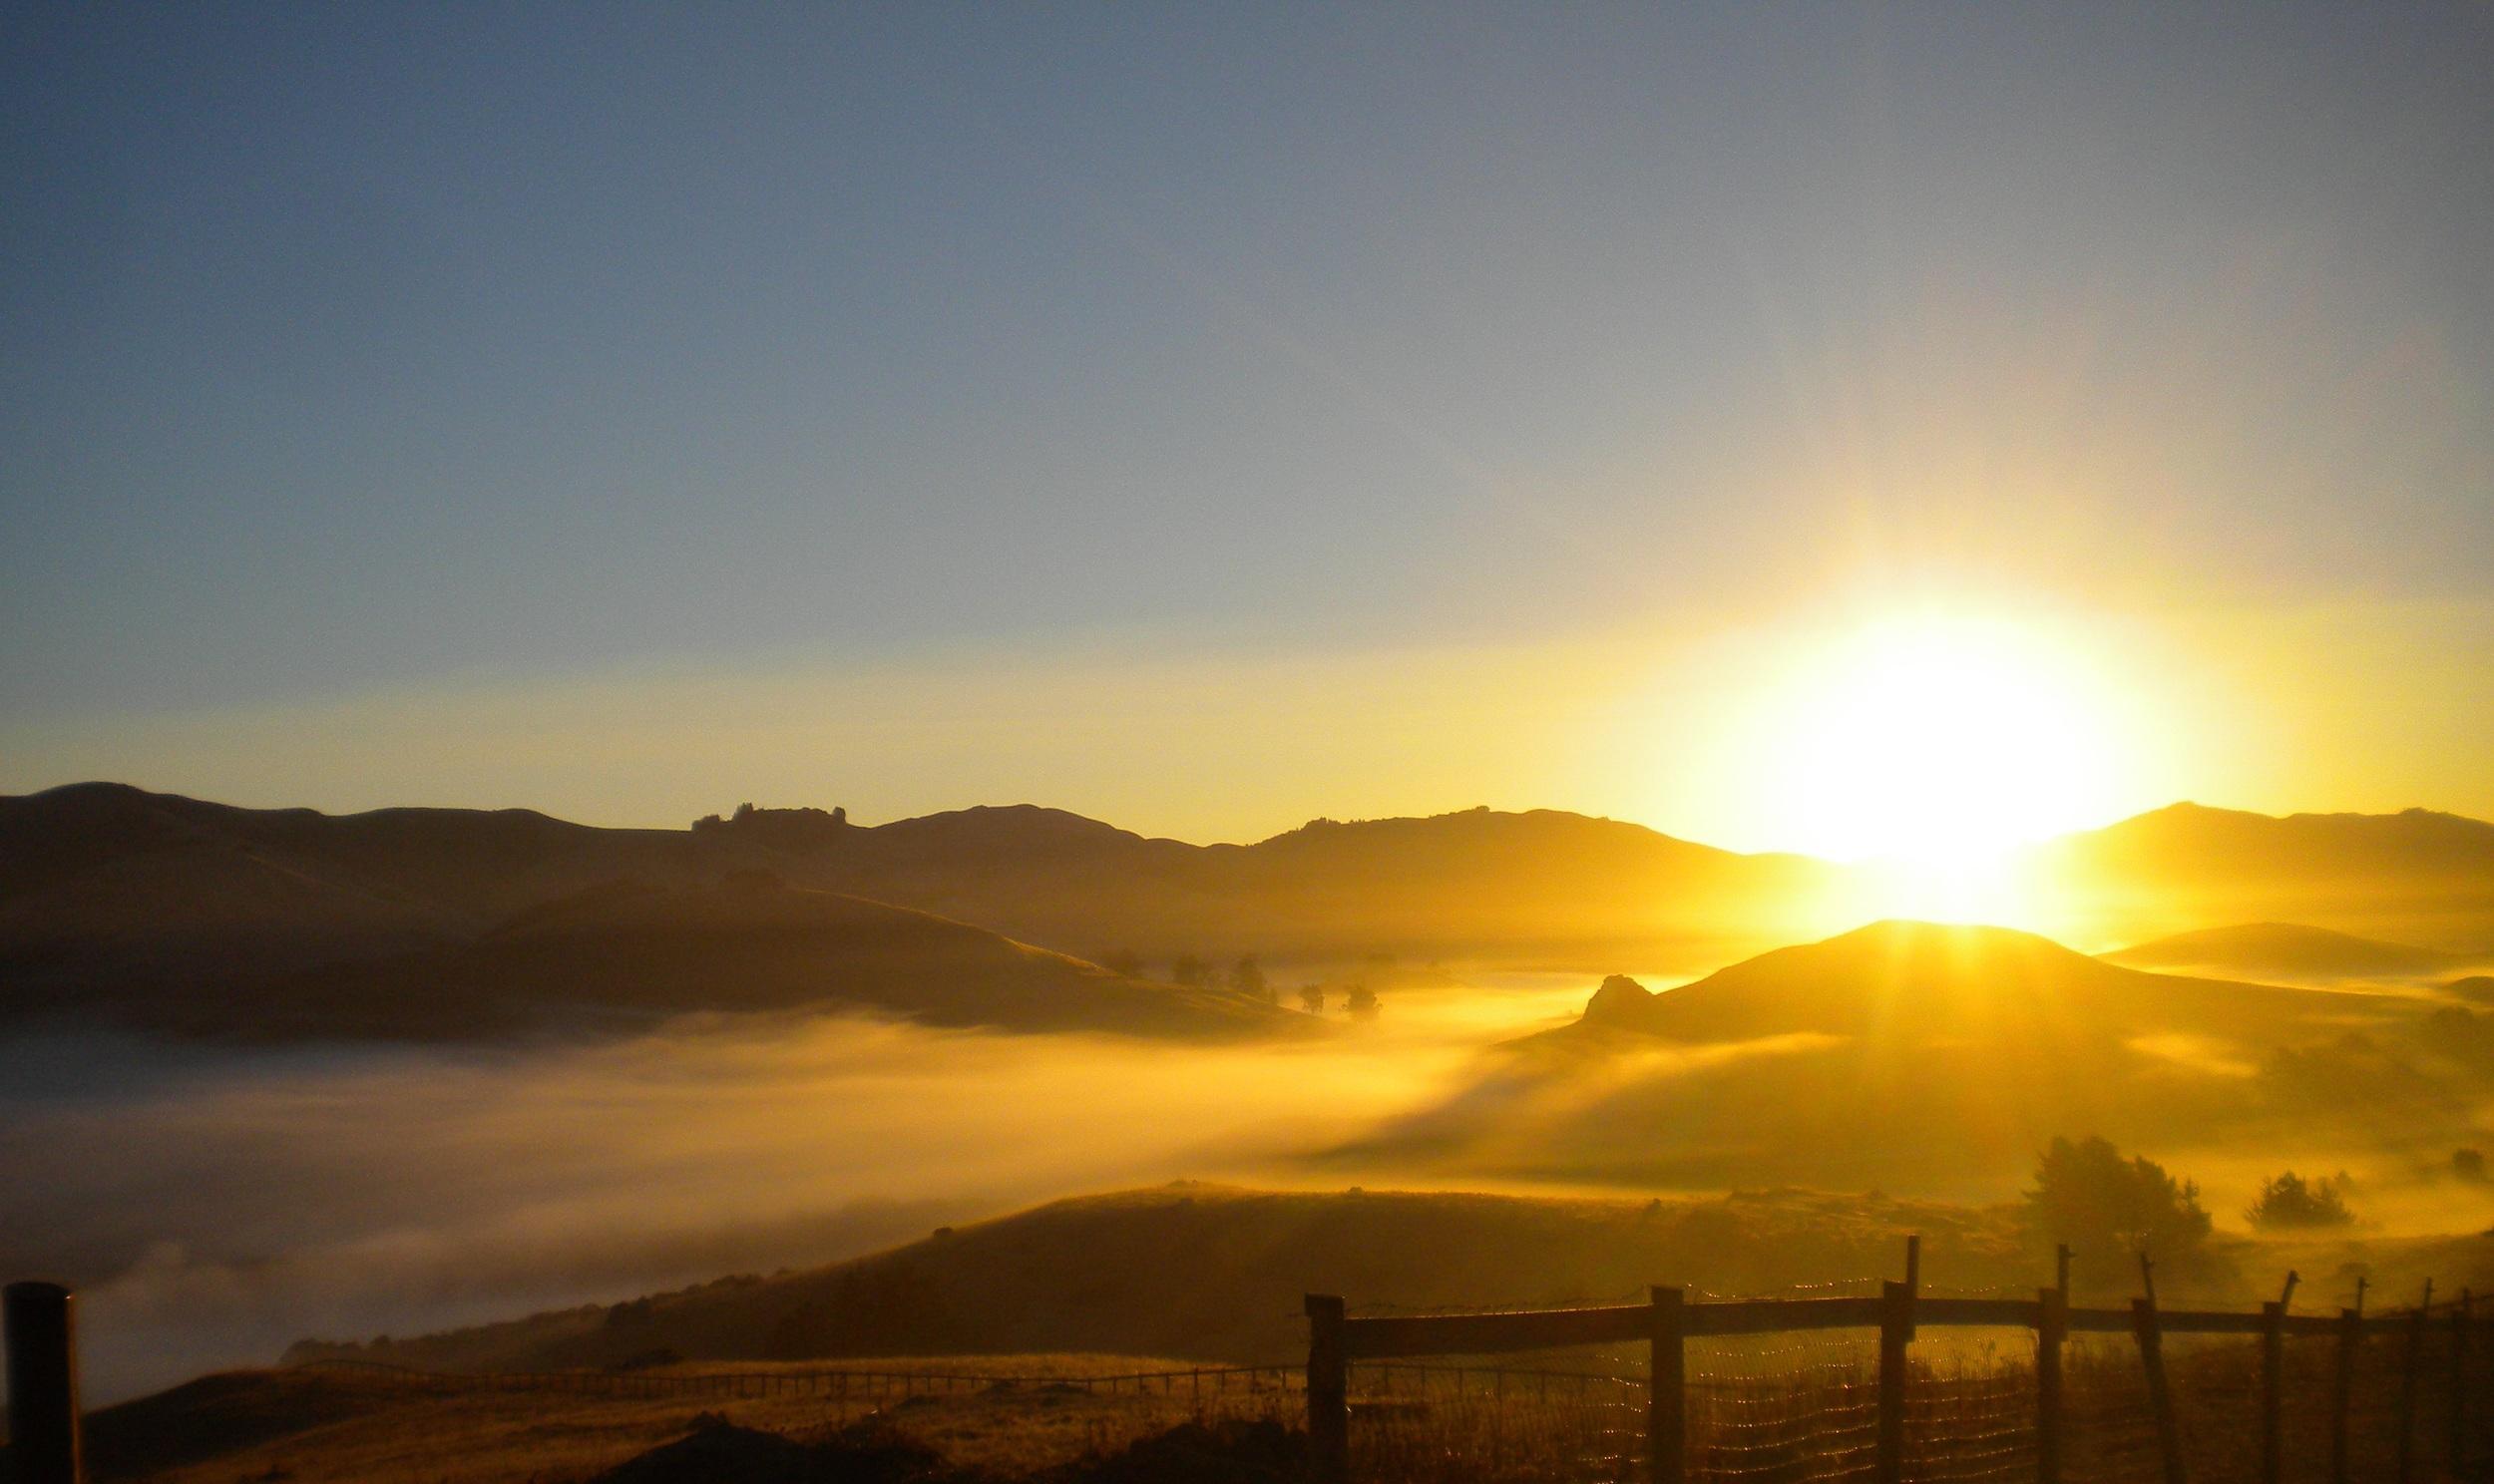 sunrise over Nicasio valley seen from Danehill 001.jpg